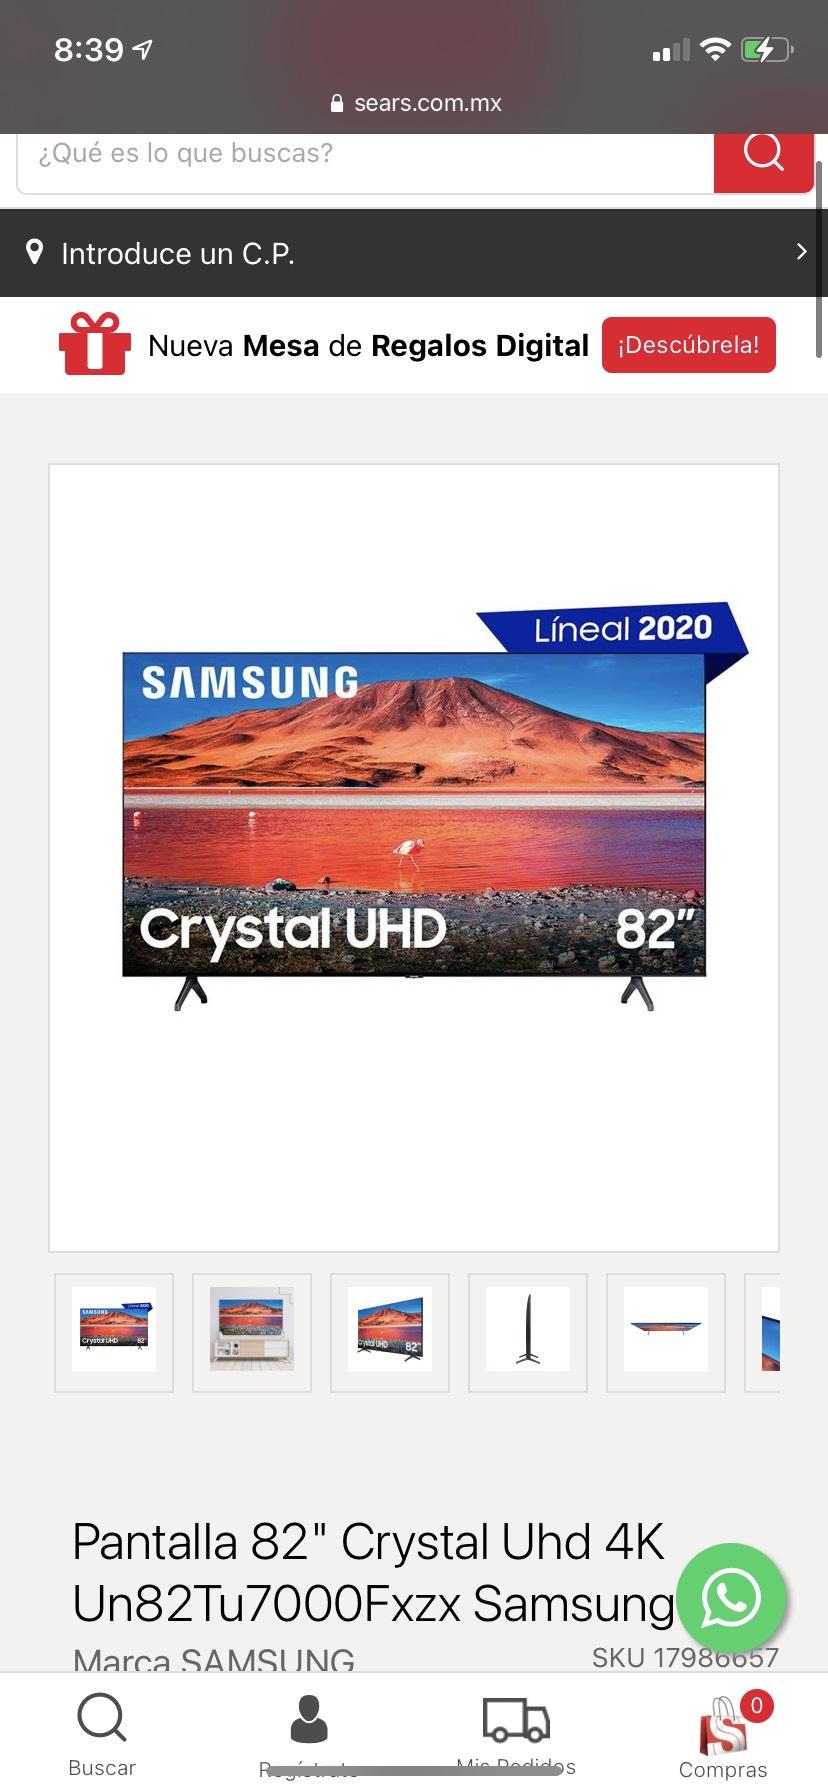 "Sears: TV SAMSUNG 82"" PULGADAS: UN82TU7000FXZX"